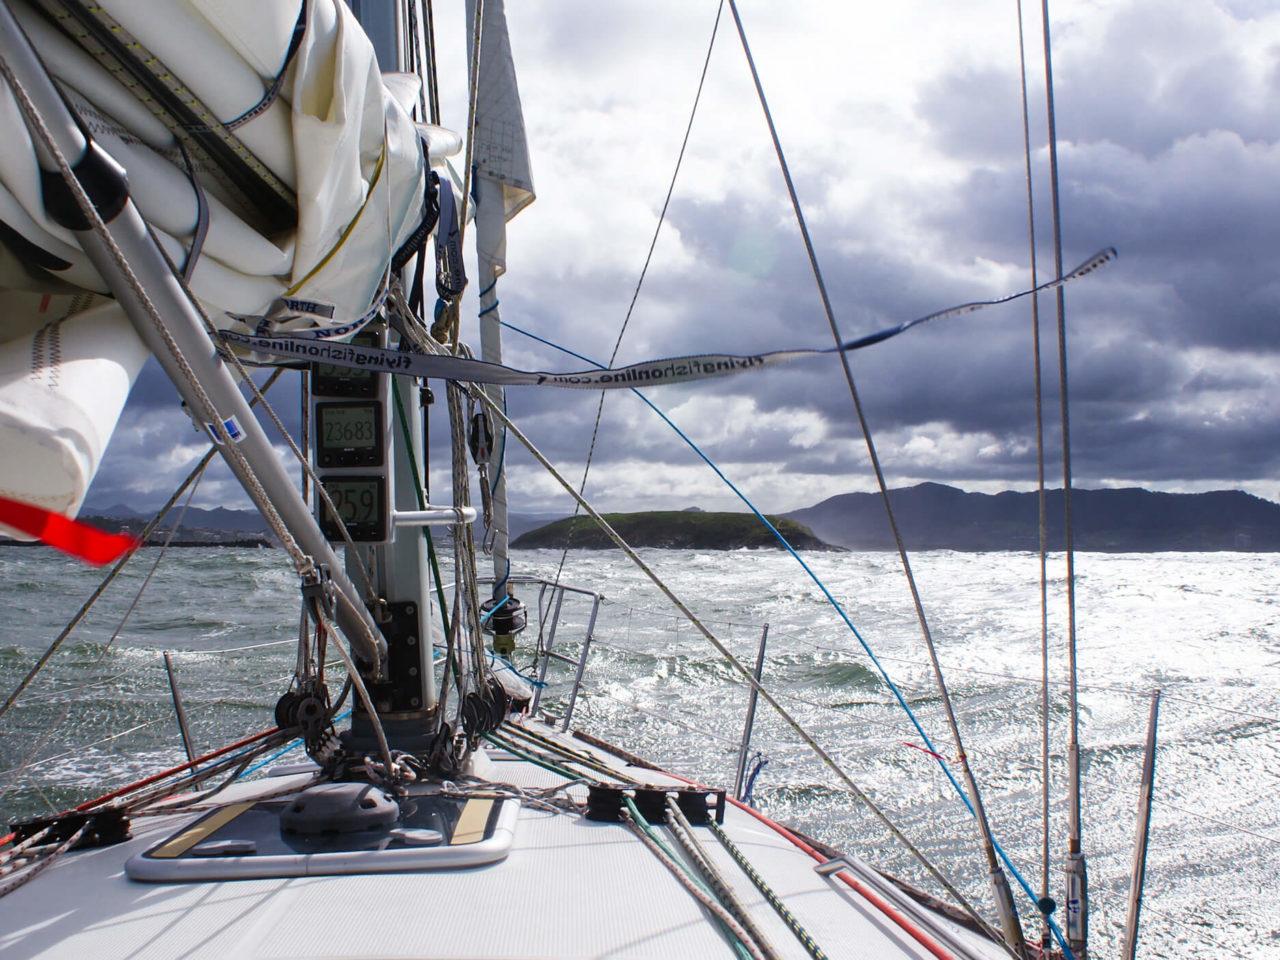 Flying-FIsh-Sailing--014